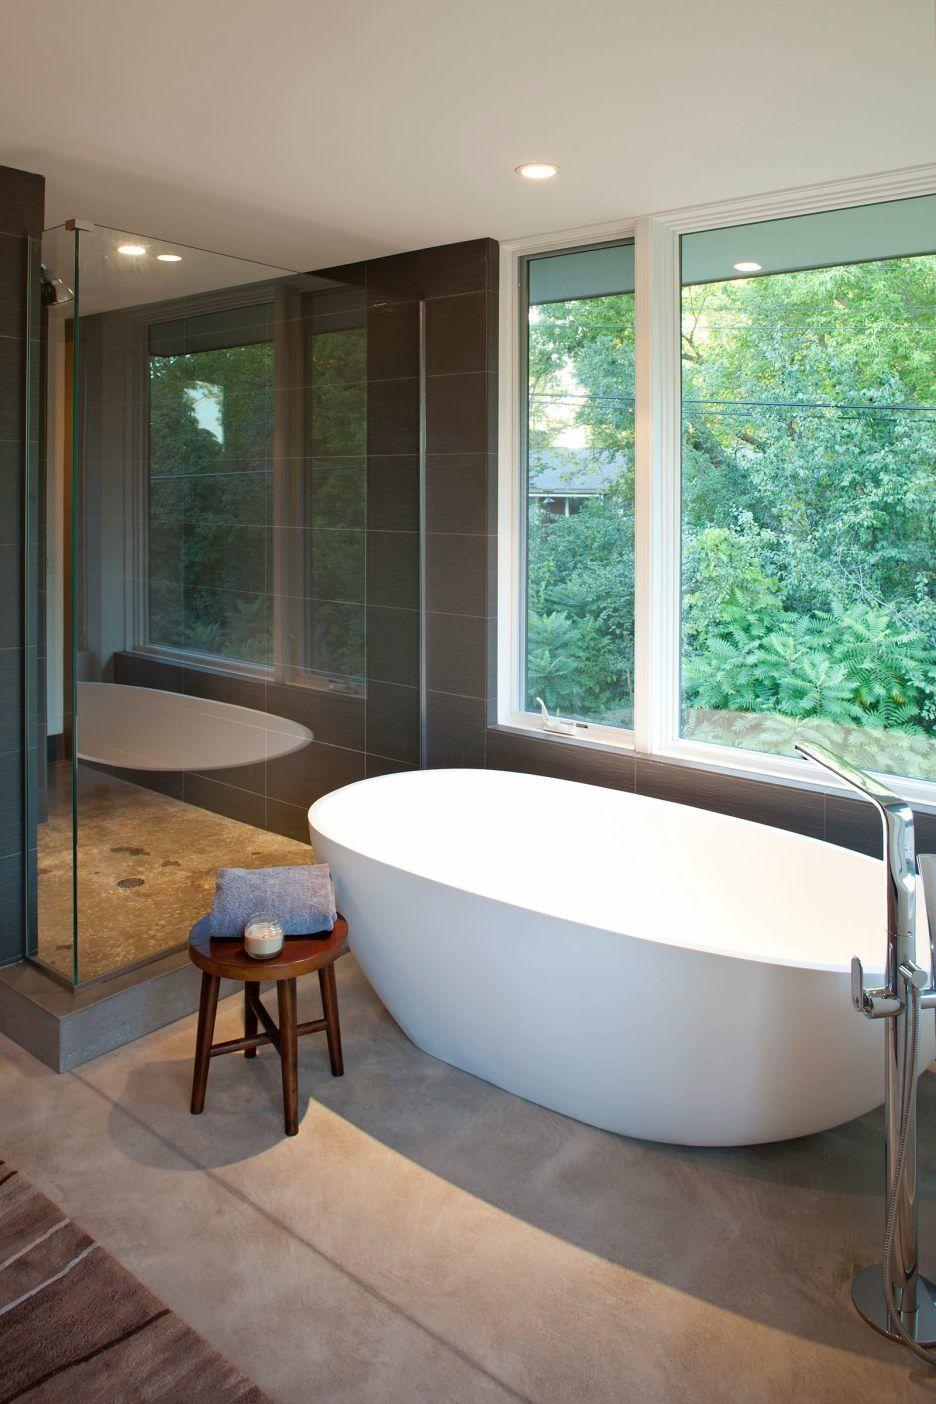 Appealing Freestanding Bathtub for Bathroom Decoration Ideas ...